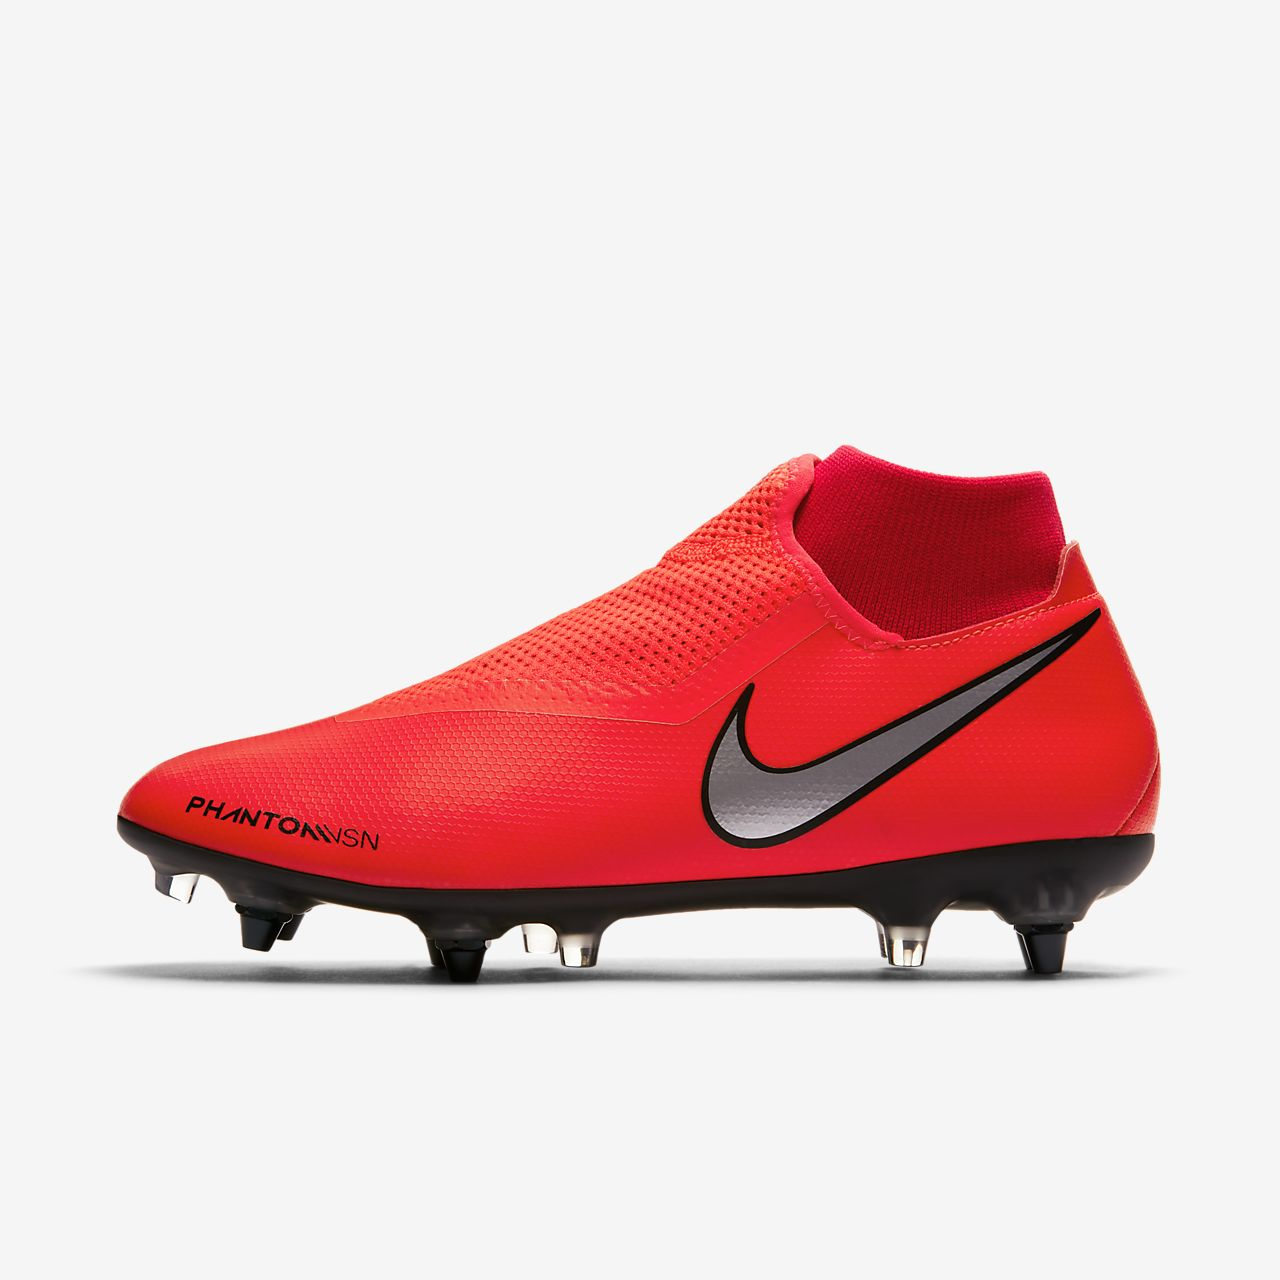 buy popular b211e c2732 ... Nike PhantomVSN Academy Dynamic Fit SG-Pro Anti-Clog Traction  fotballsko for vått gress